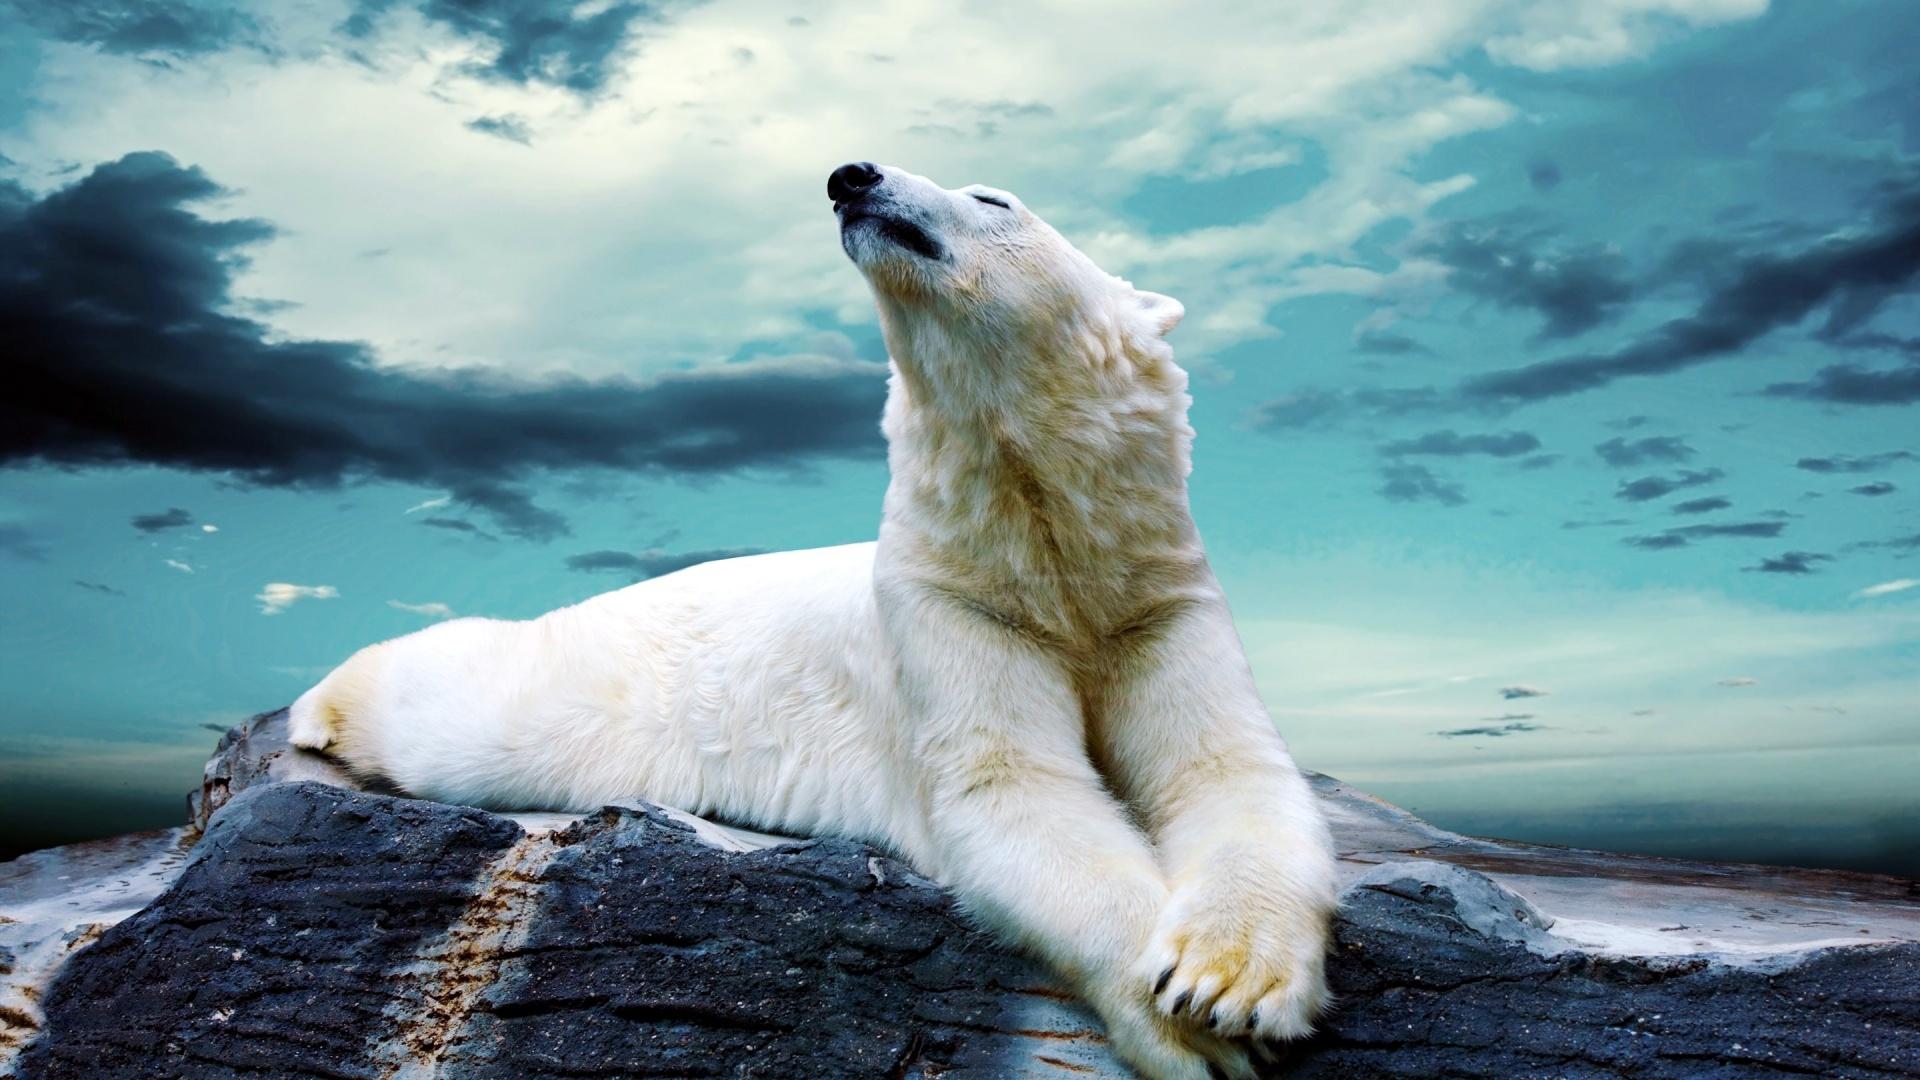 animal wallpaper chilling